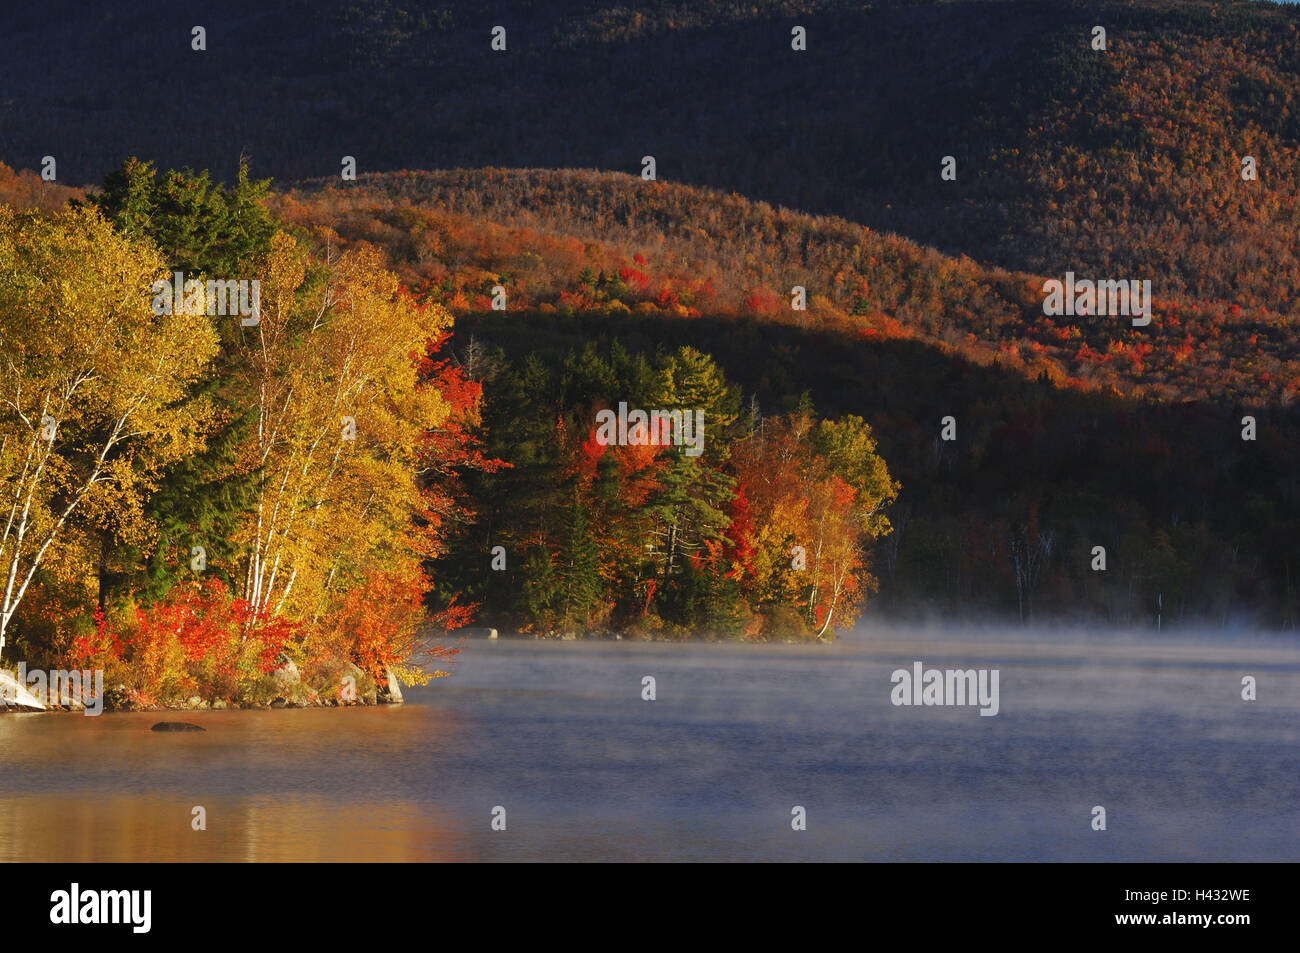 Forest Usa Fog Stockfotos & Forest Usa Fog Bilder - Seite 34 - Alamy